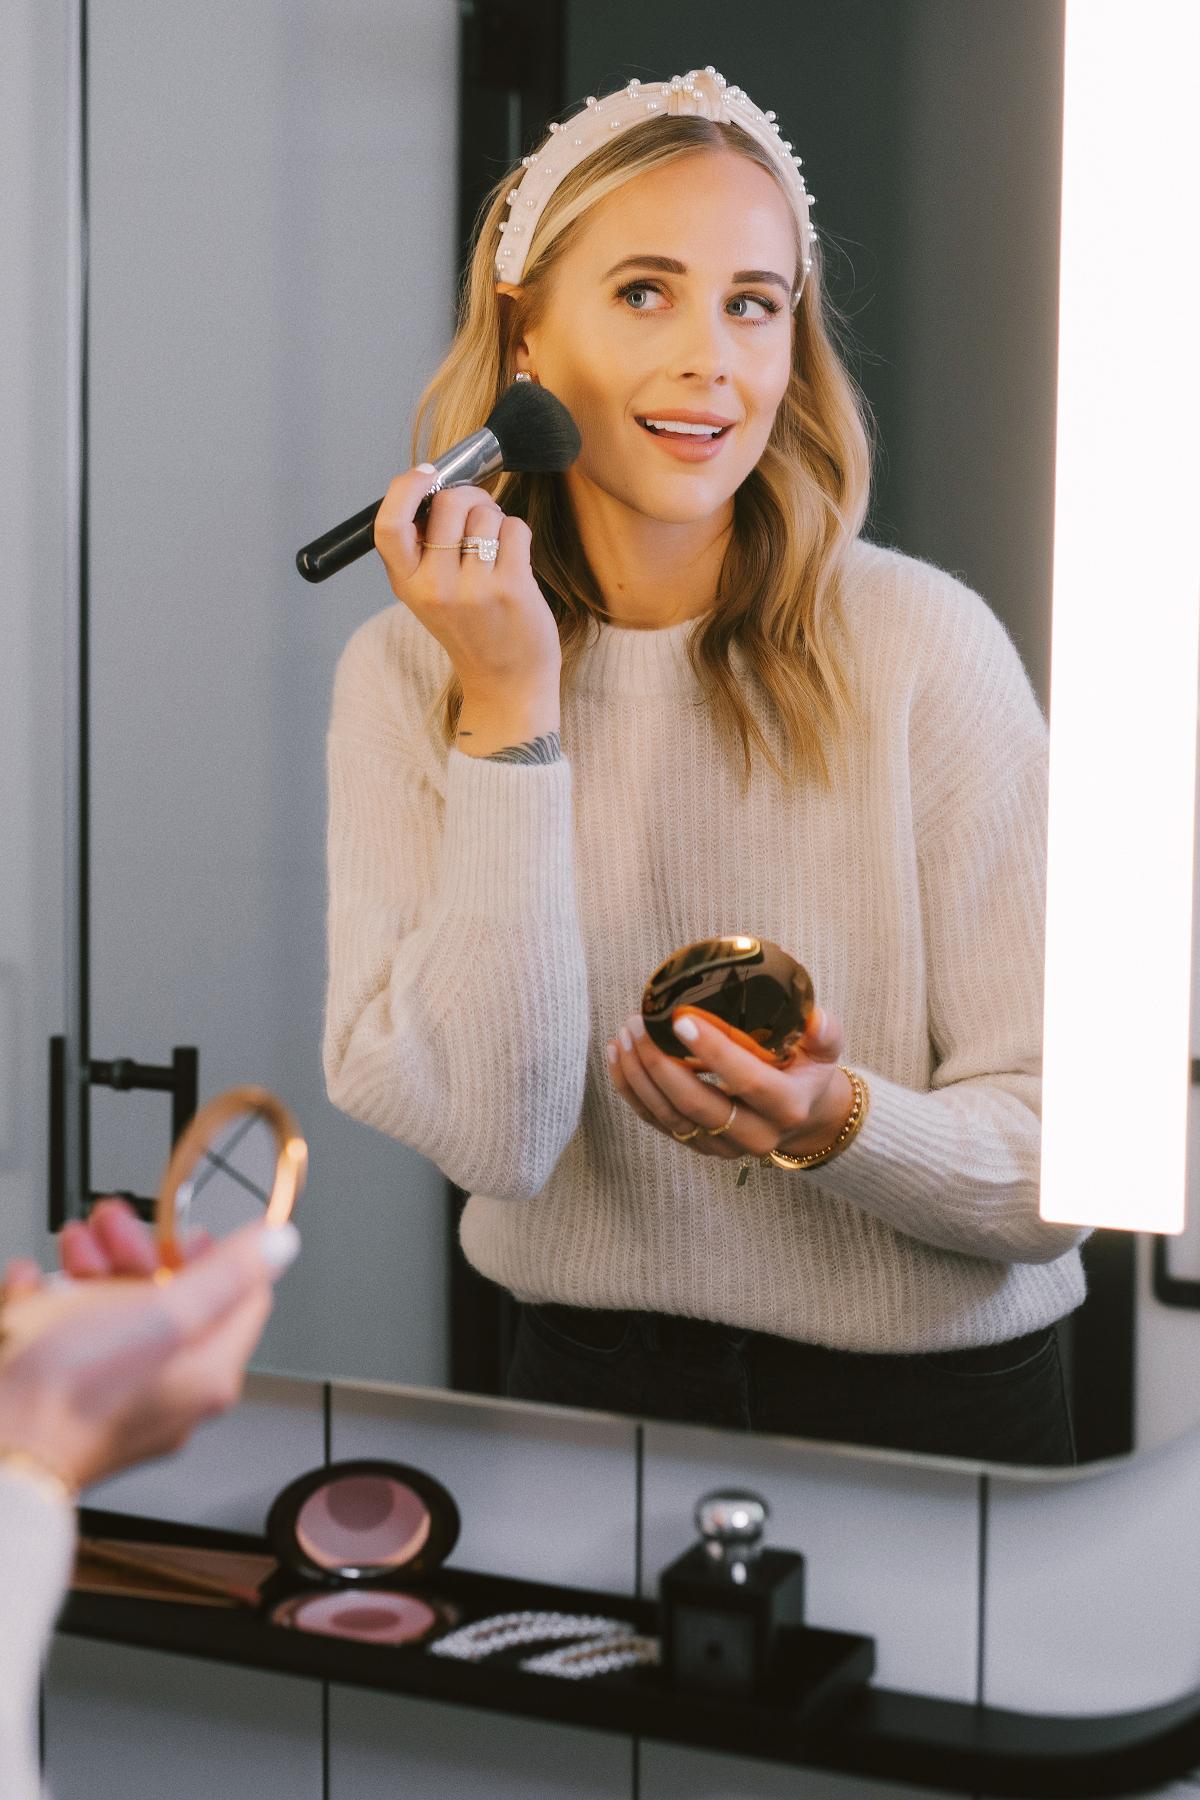 fashion jackson everyday makeup sephora holiday beauty event 2019 charlotte tilbury powder